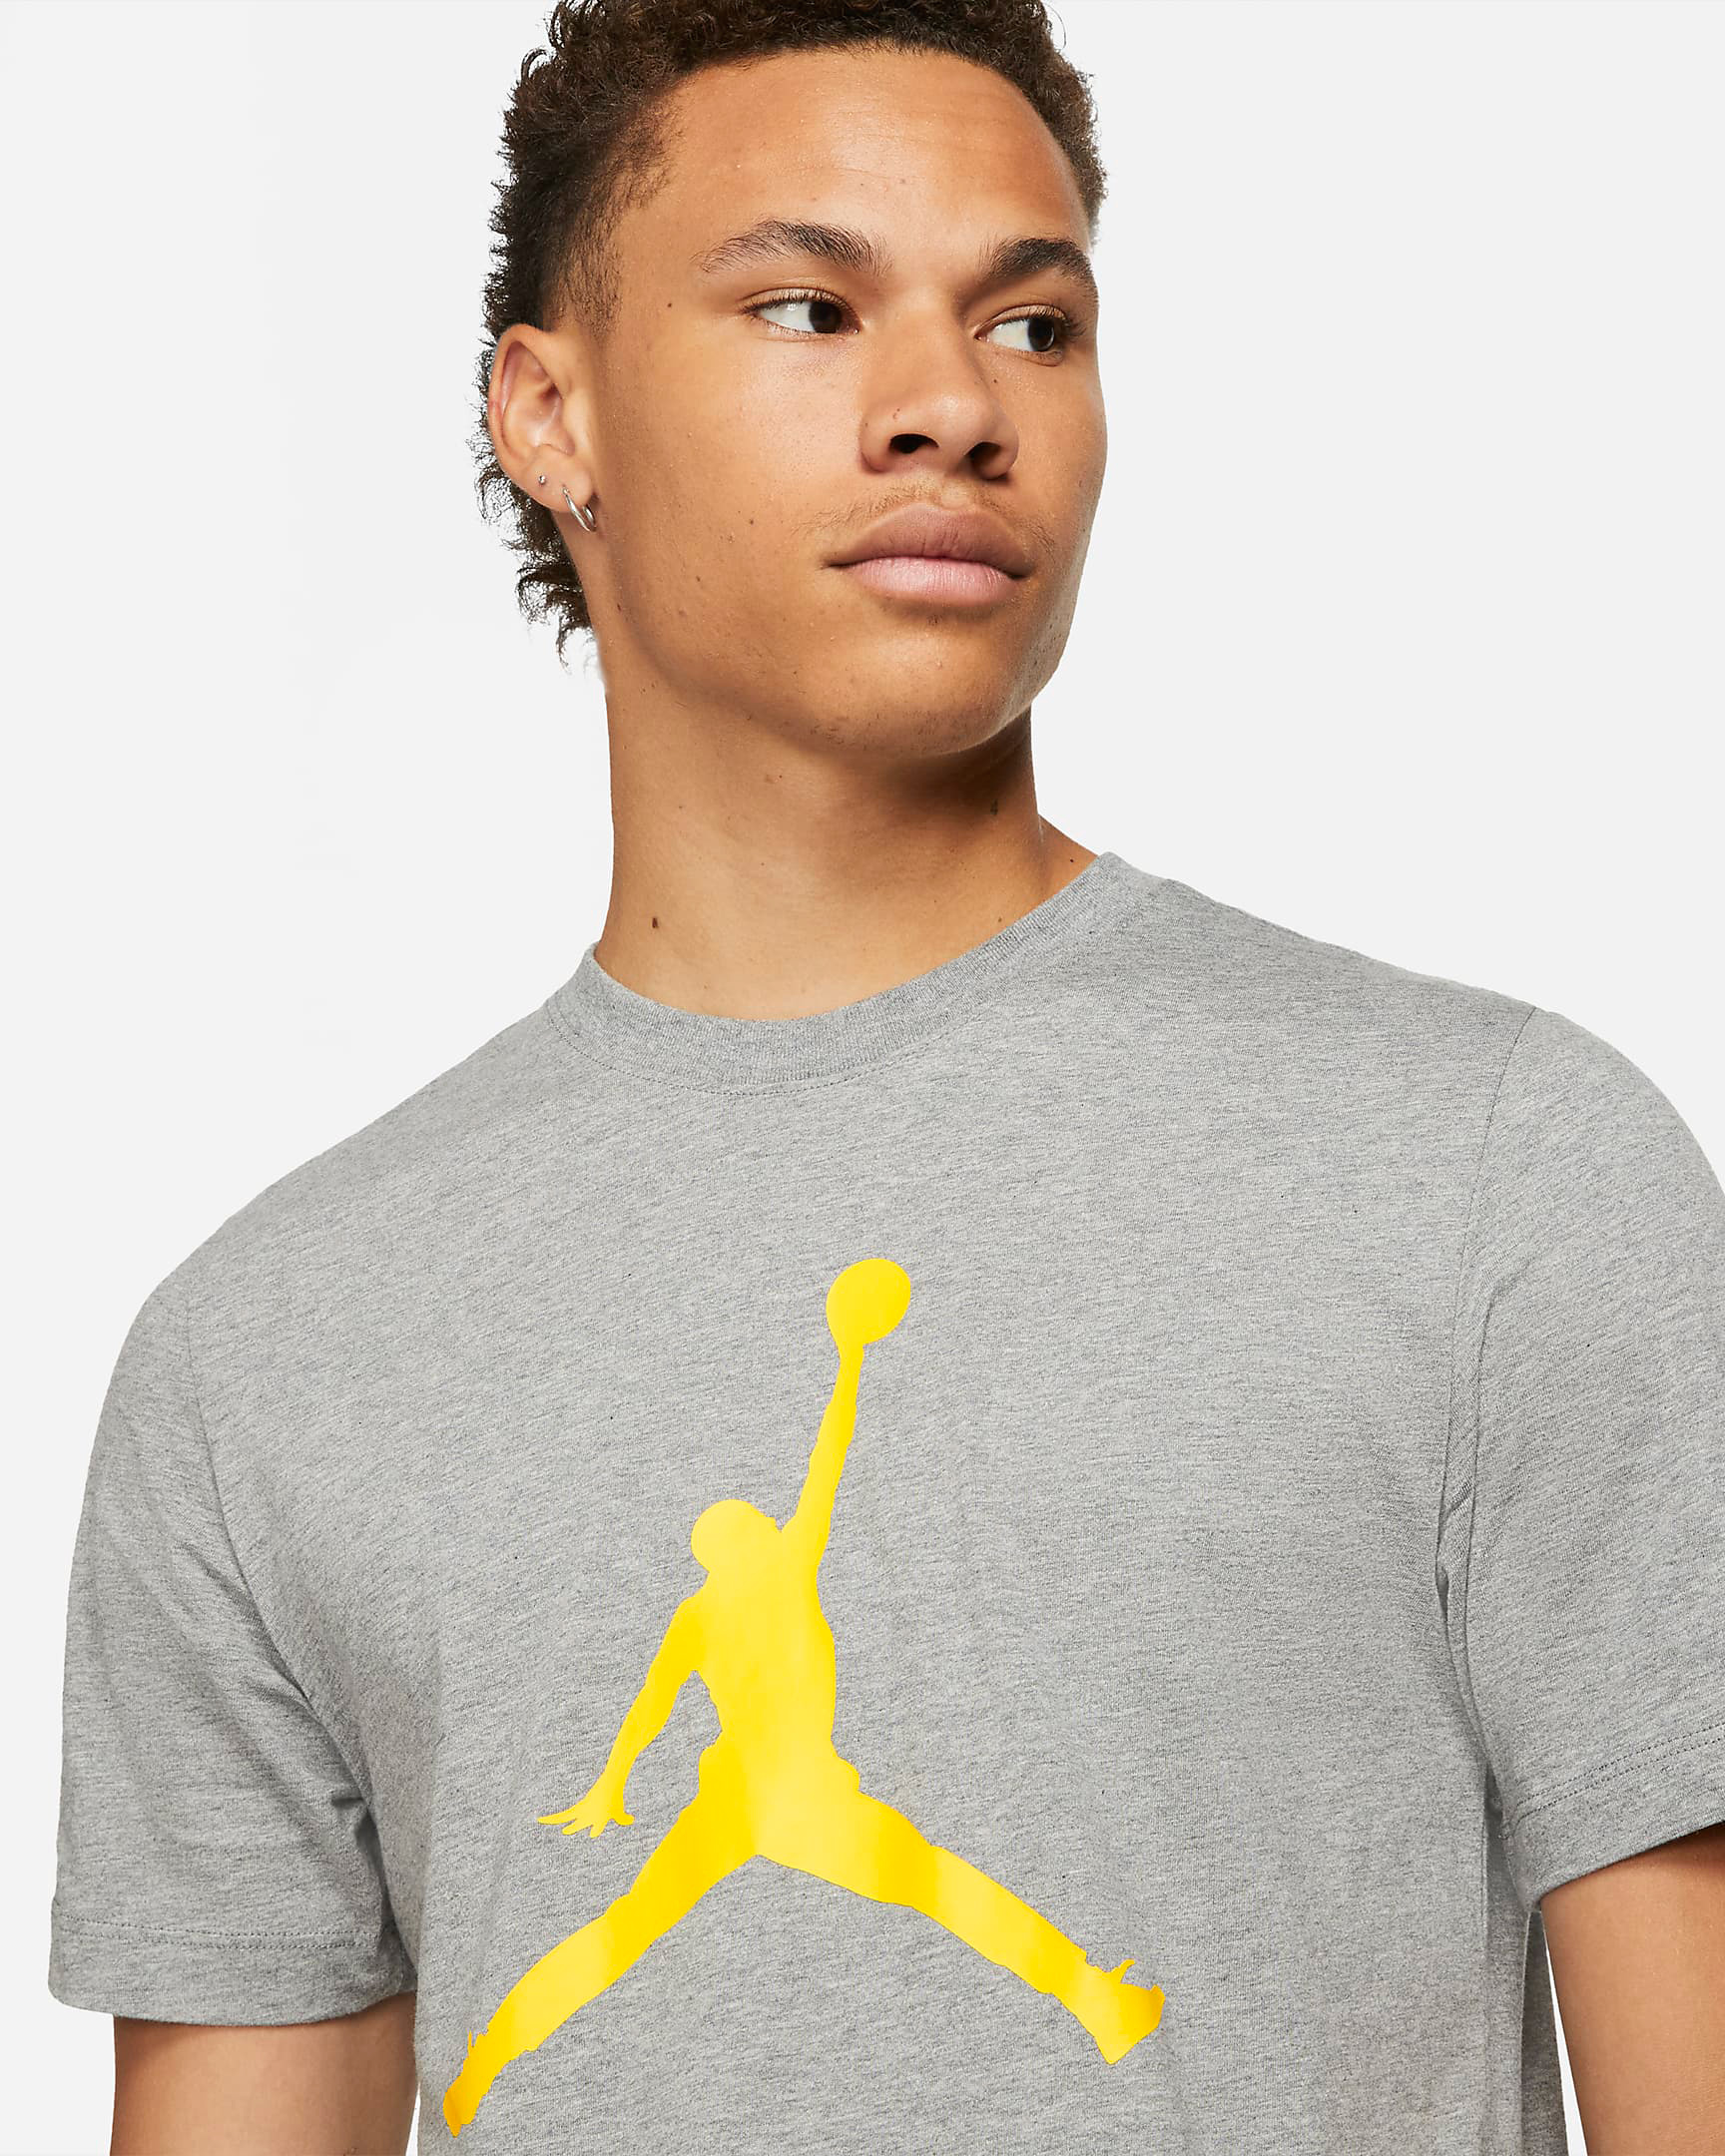 jordan-4-lightning-sneaker-tee-shirt